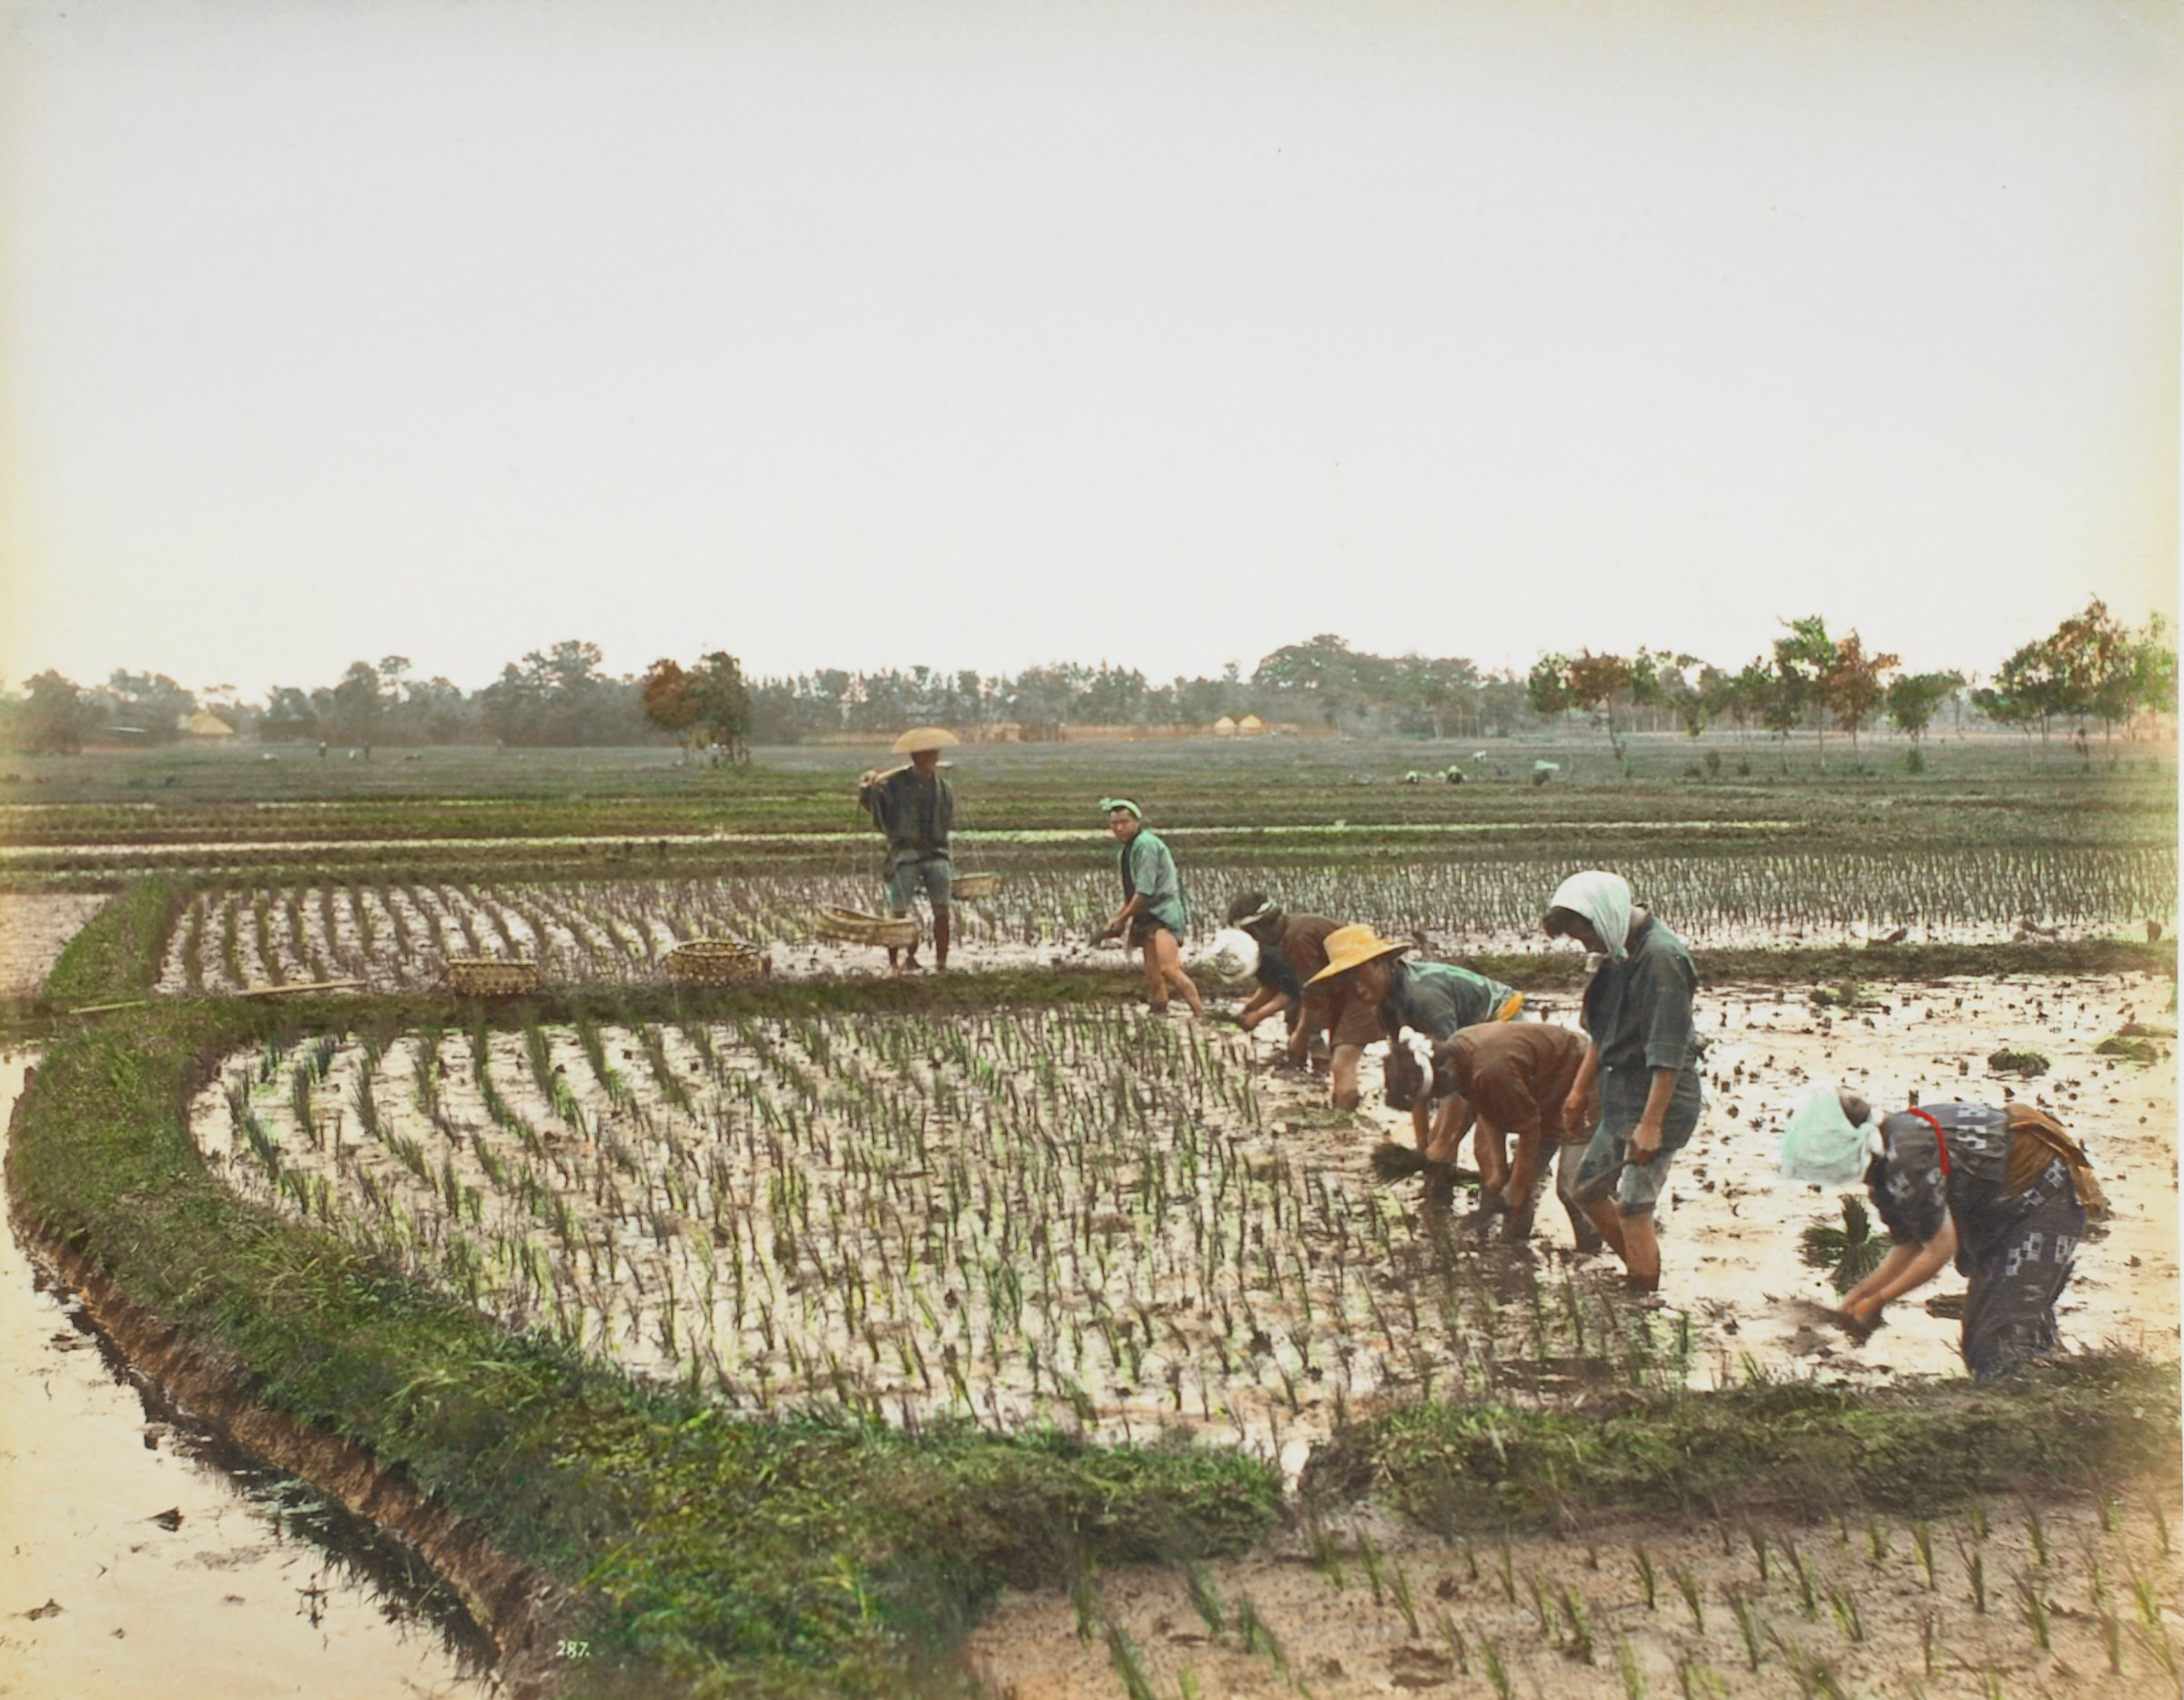 Orange Shop (.16, recto); Planting Rice (.17, verso), Attributed to Kusakabe Kimbei, hand-colored albumen prints mounted to album page